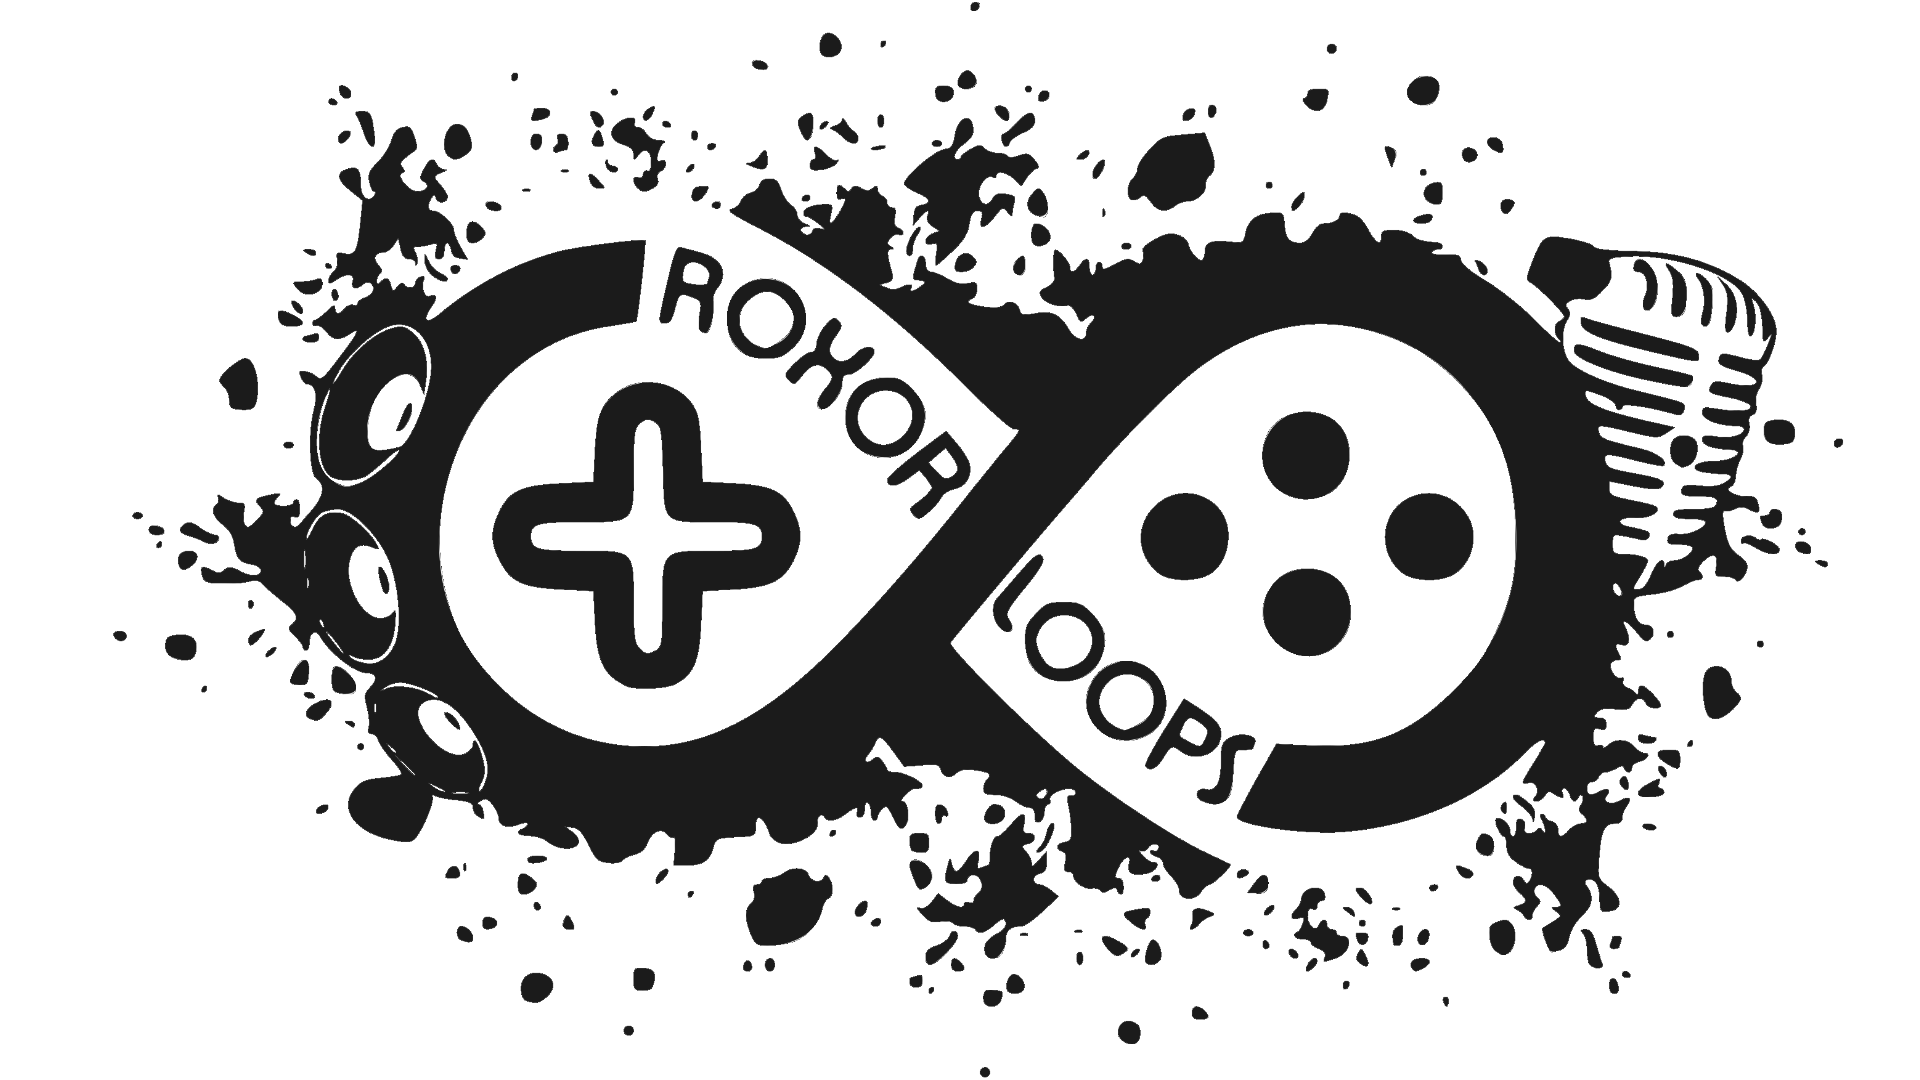 RoxorLoops